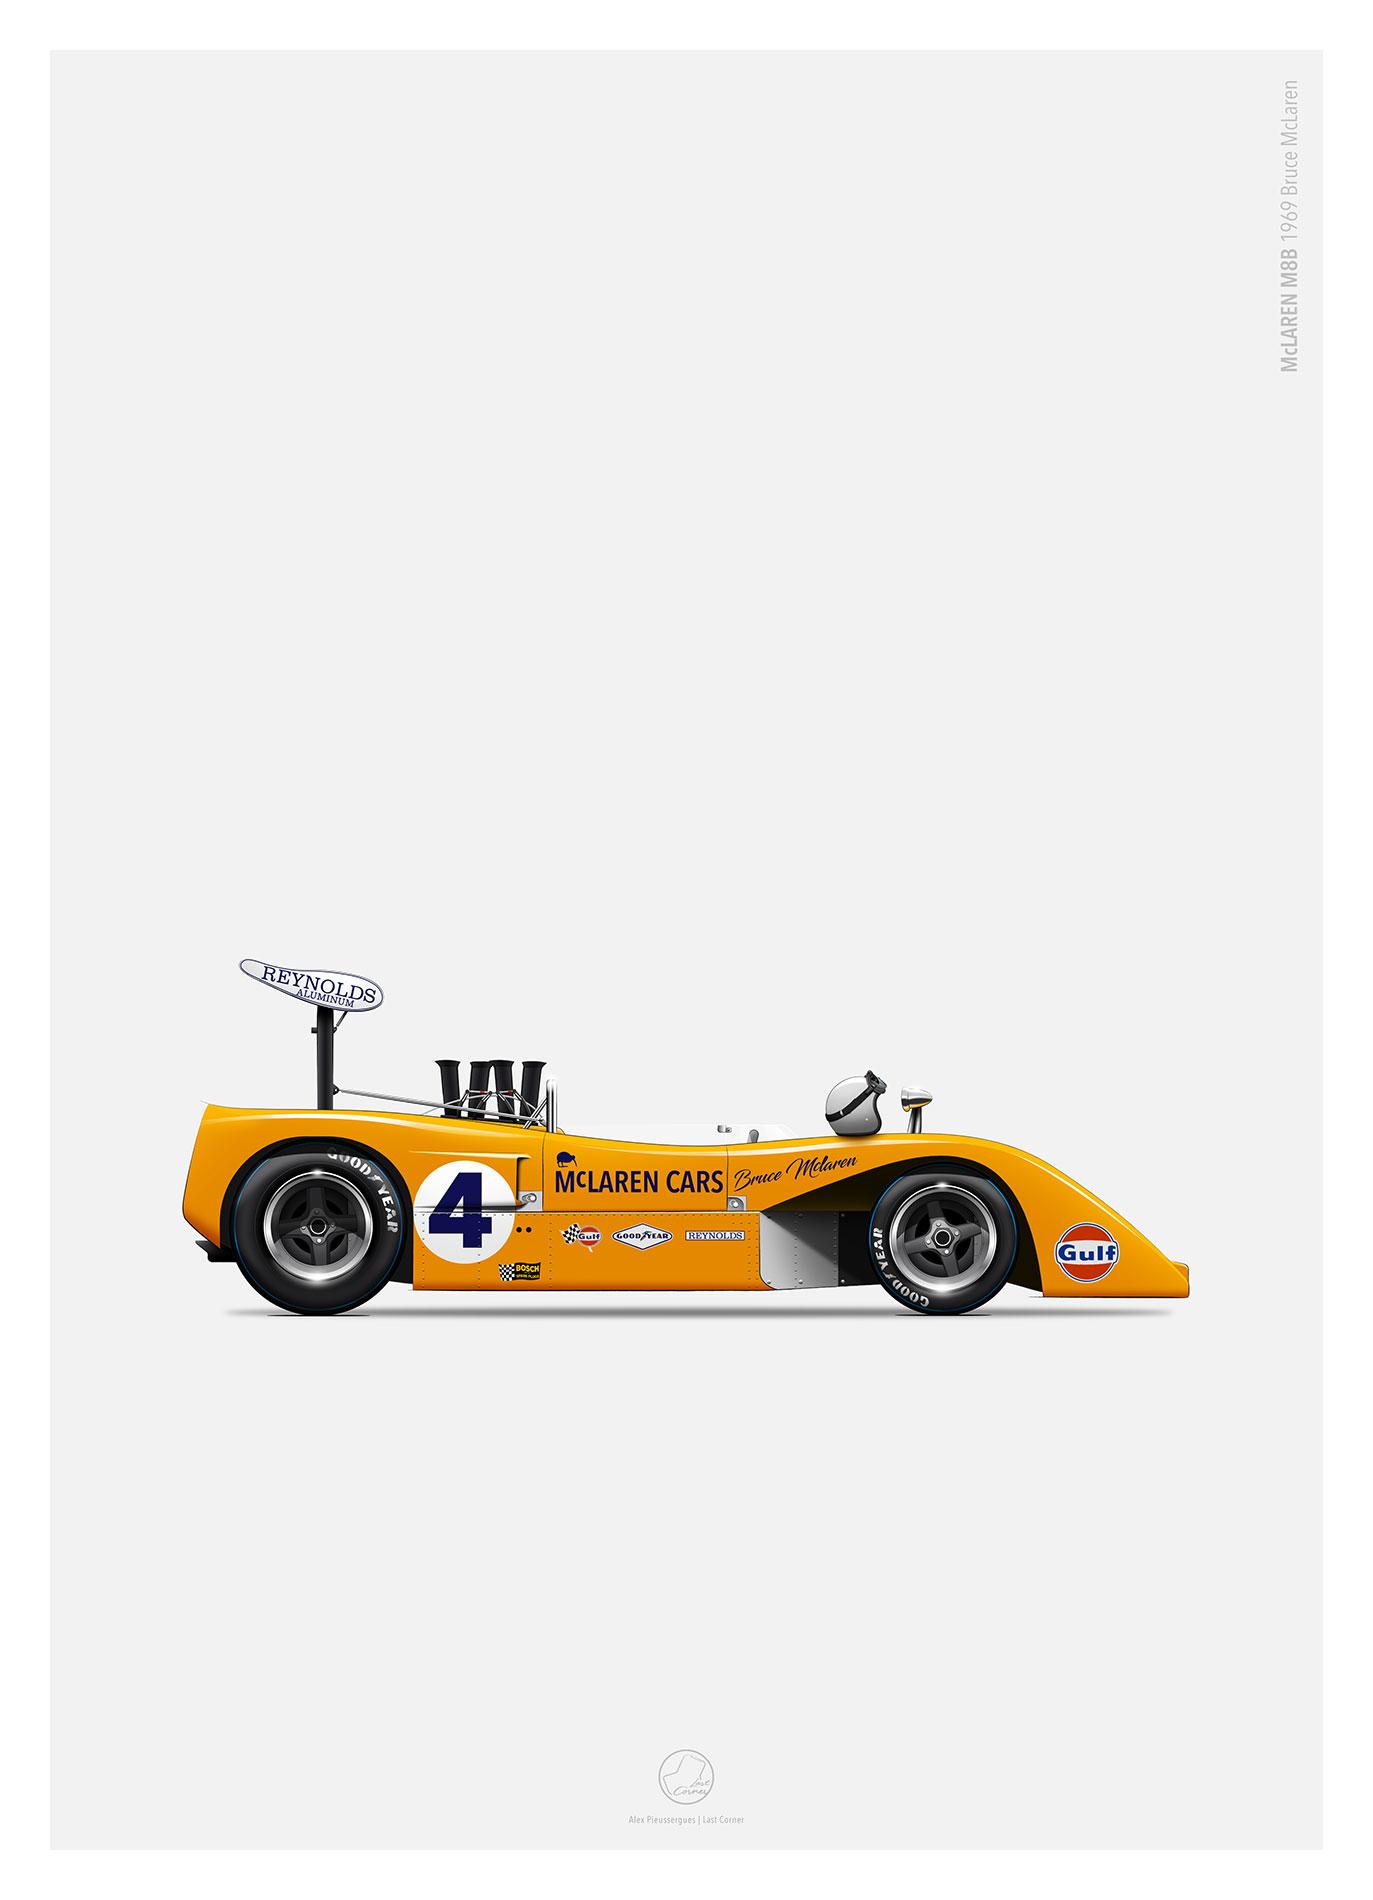 McLaren-M8B-poster